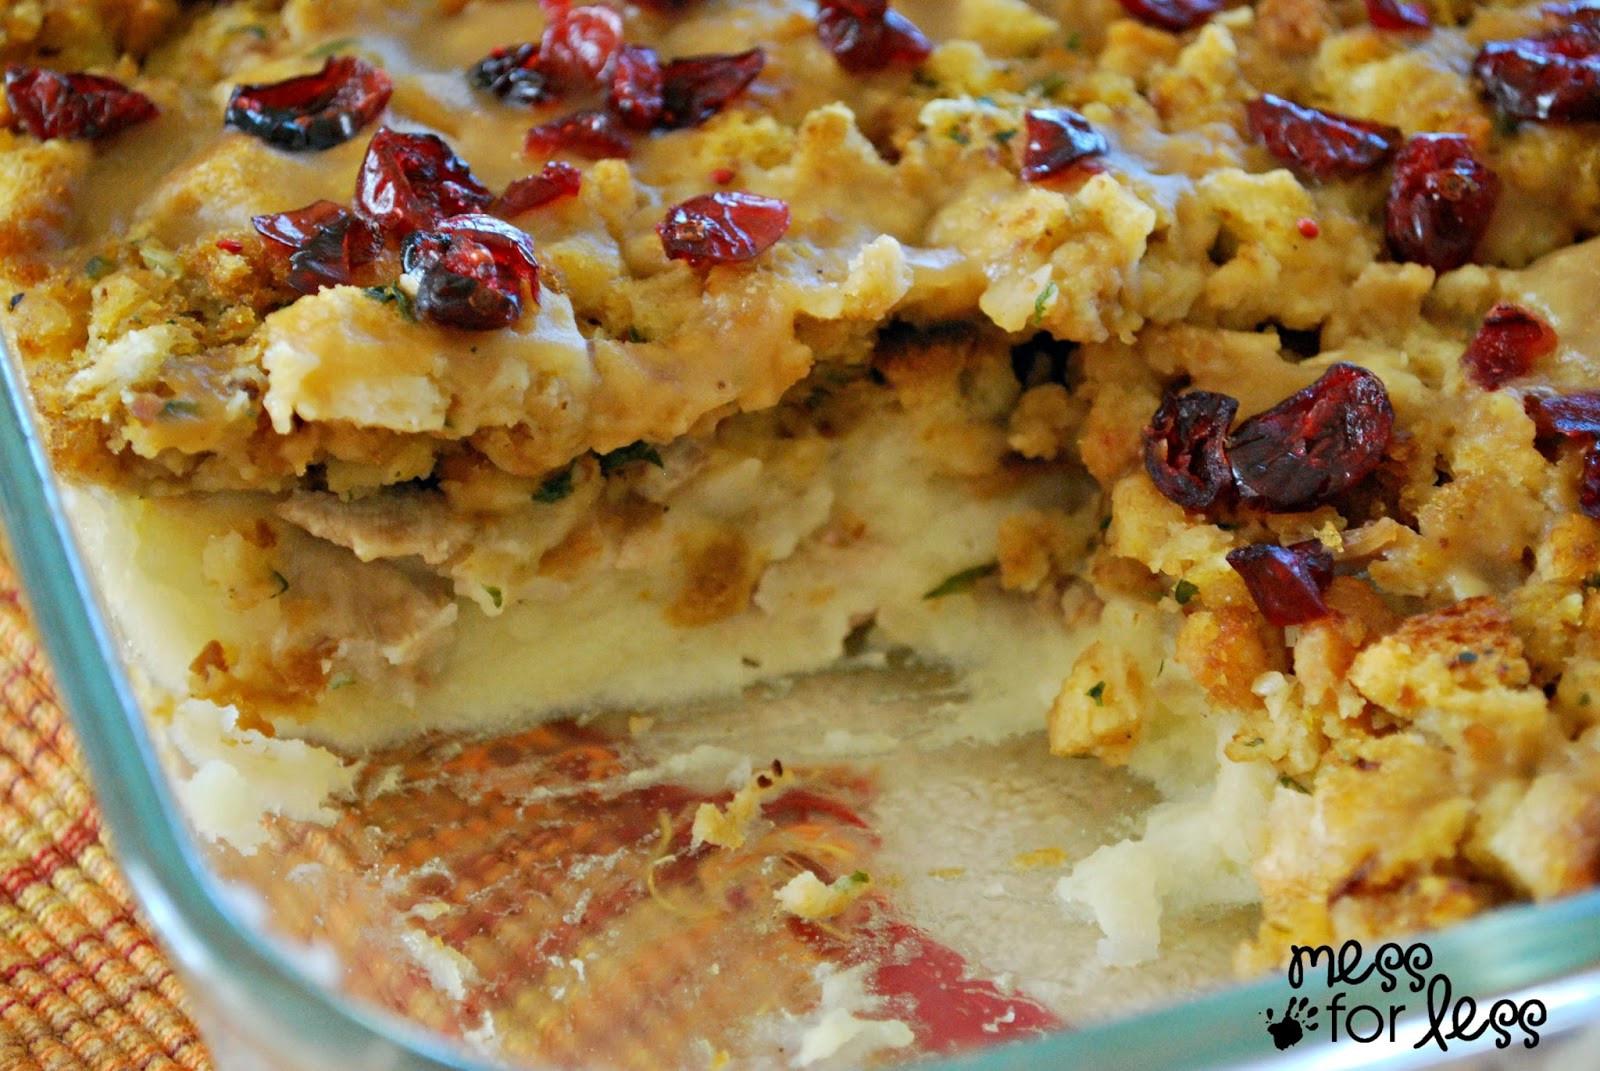 Turkey Recipes For Thanksgiving Dinner  Thanksgiving Dinner Casserole Mess for Less